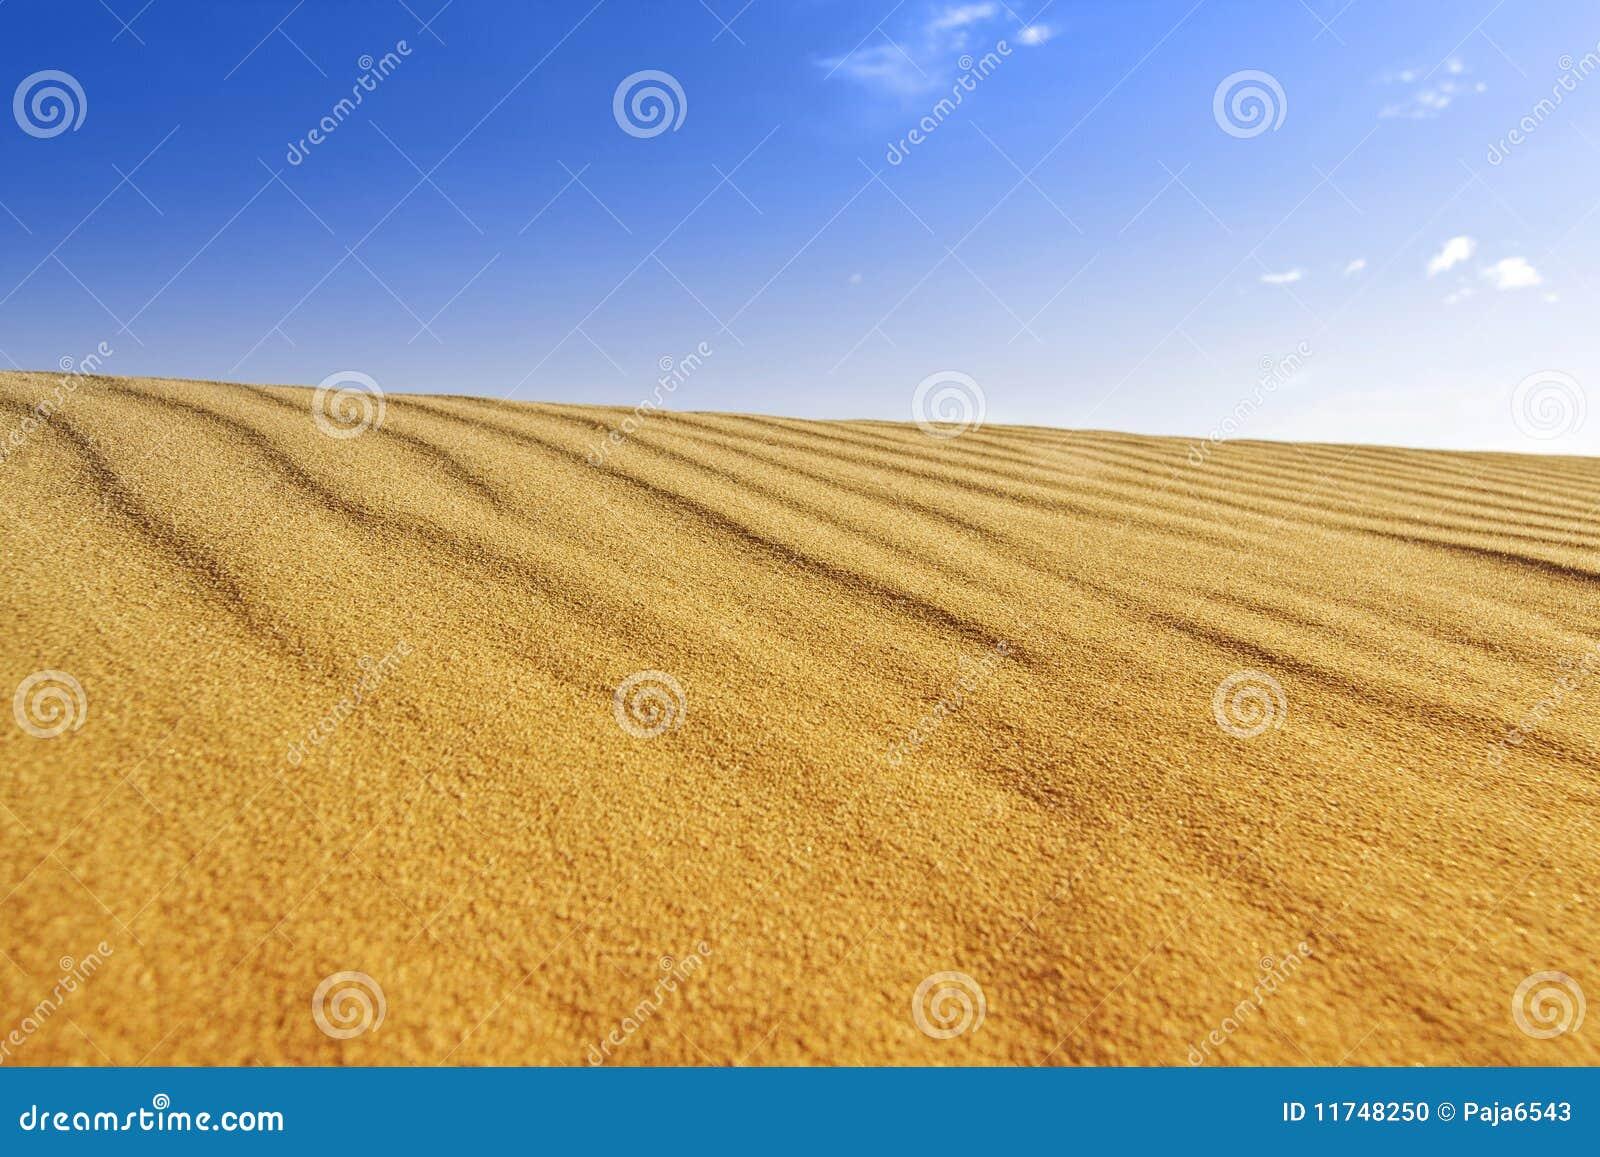 background of golden sand - photo #18